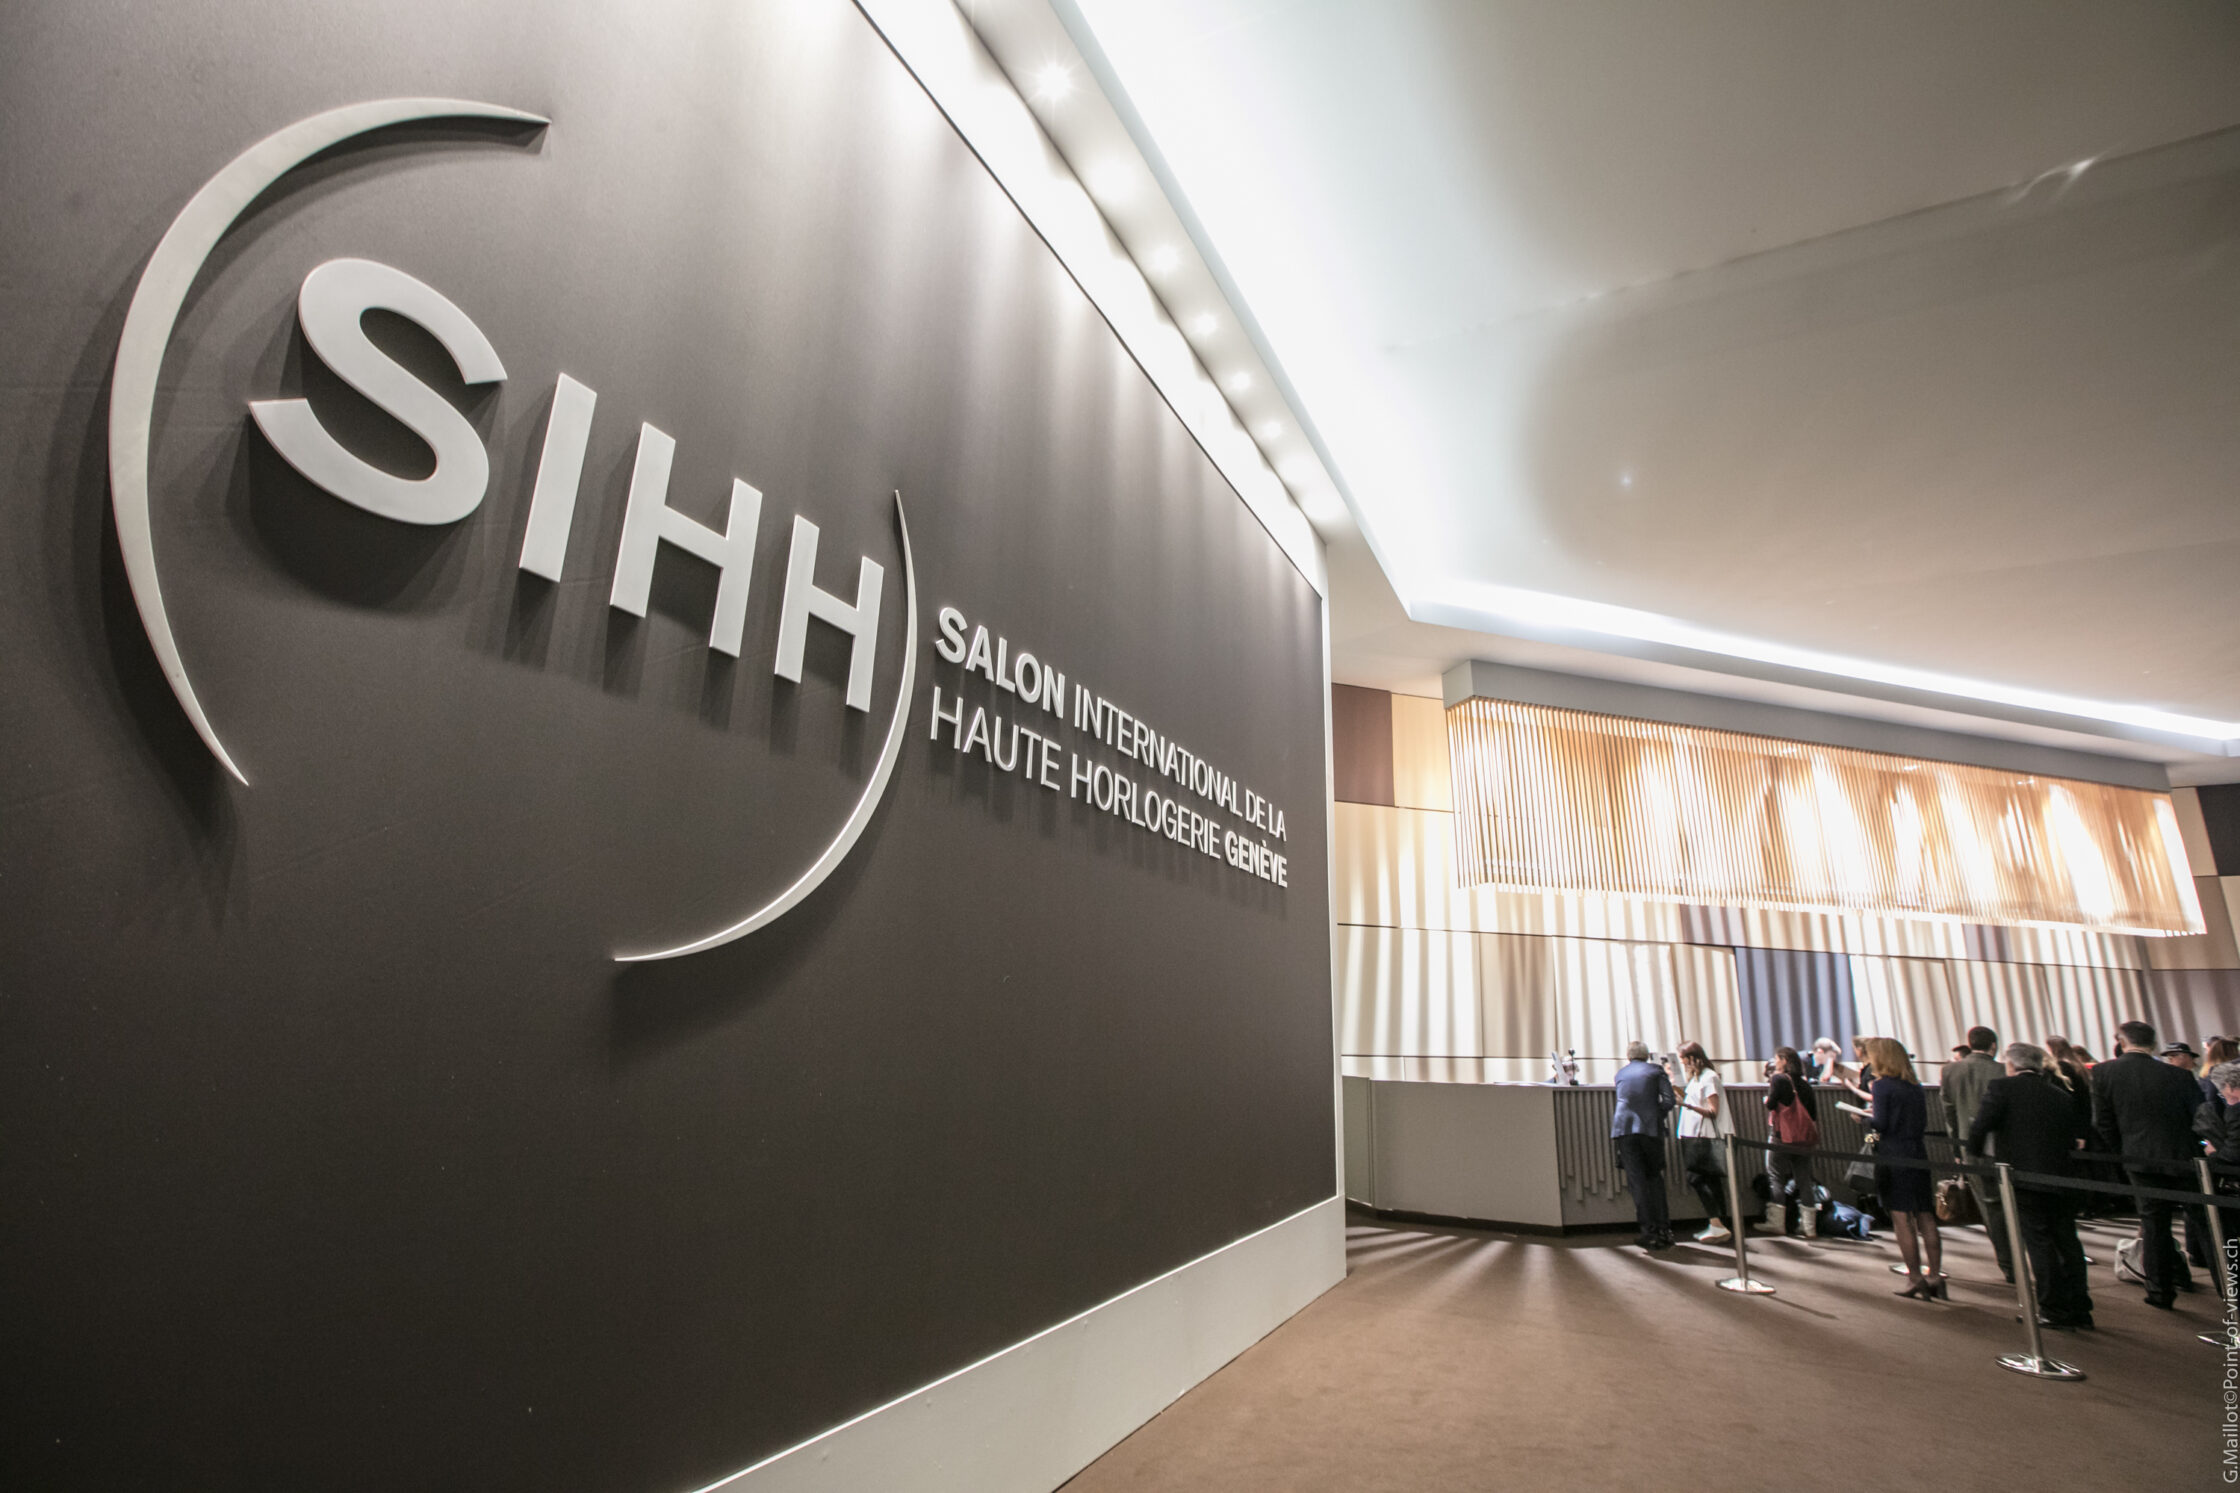 Salon International de la Haute Horlogerie (SIHH)